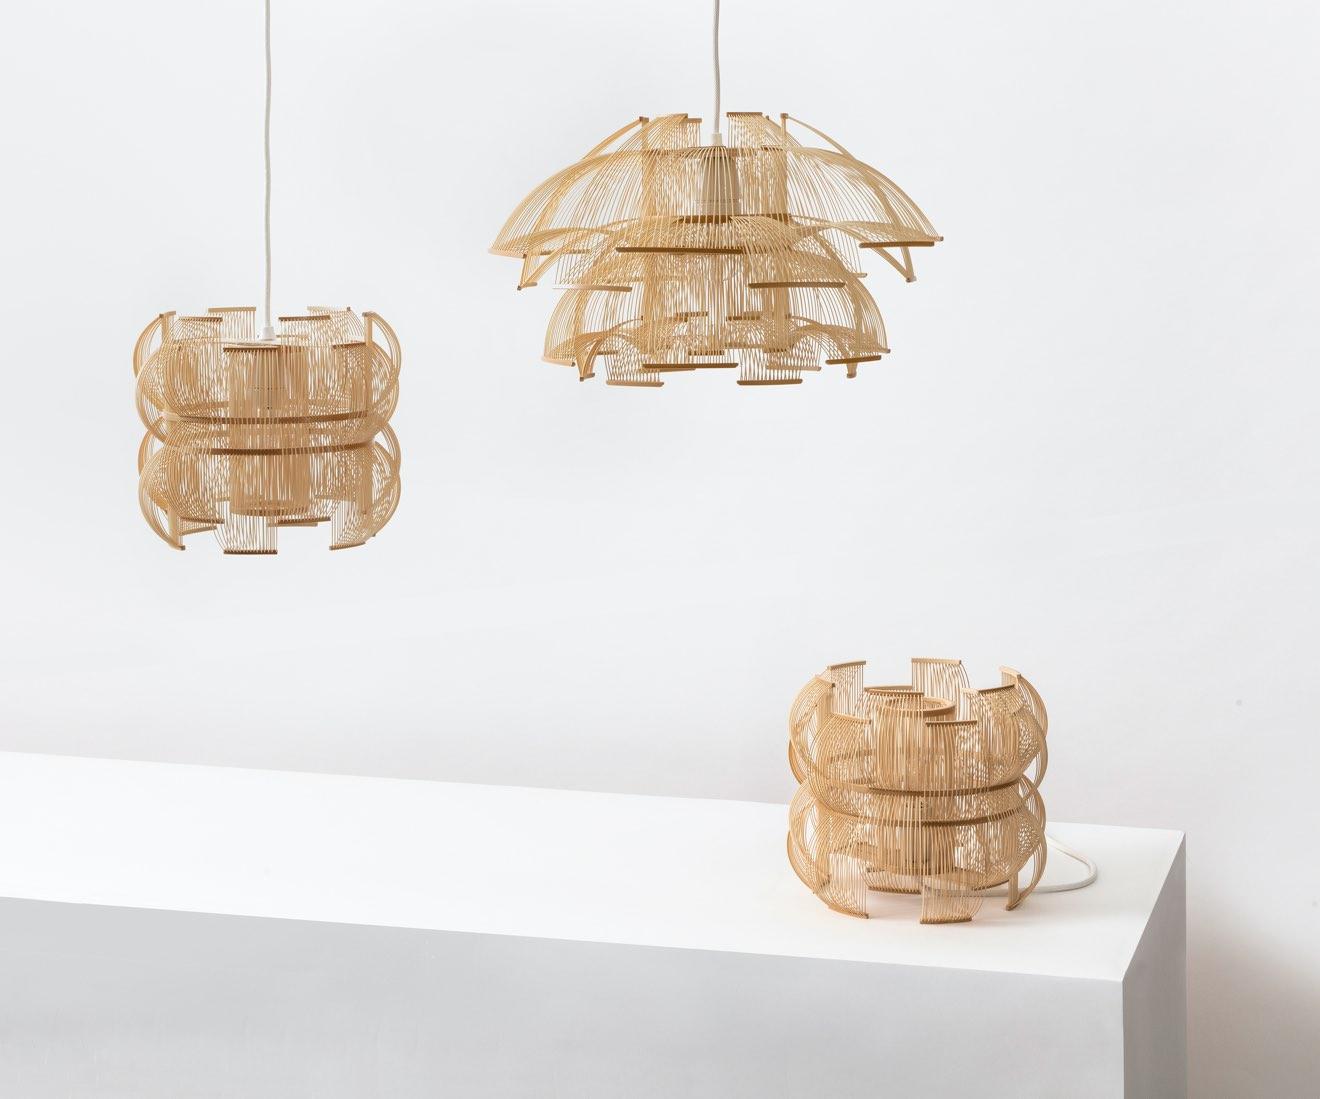 Motarasu Product - SEN-tablelamp - SEN-pendant - HOKORE-pendant by Tani Toshiyuki